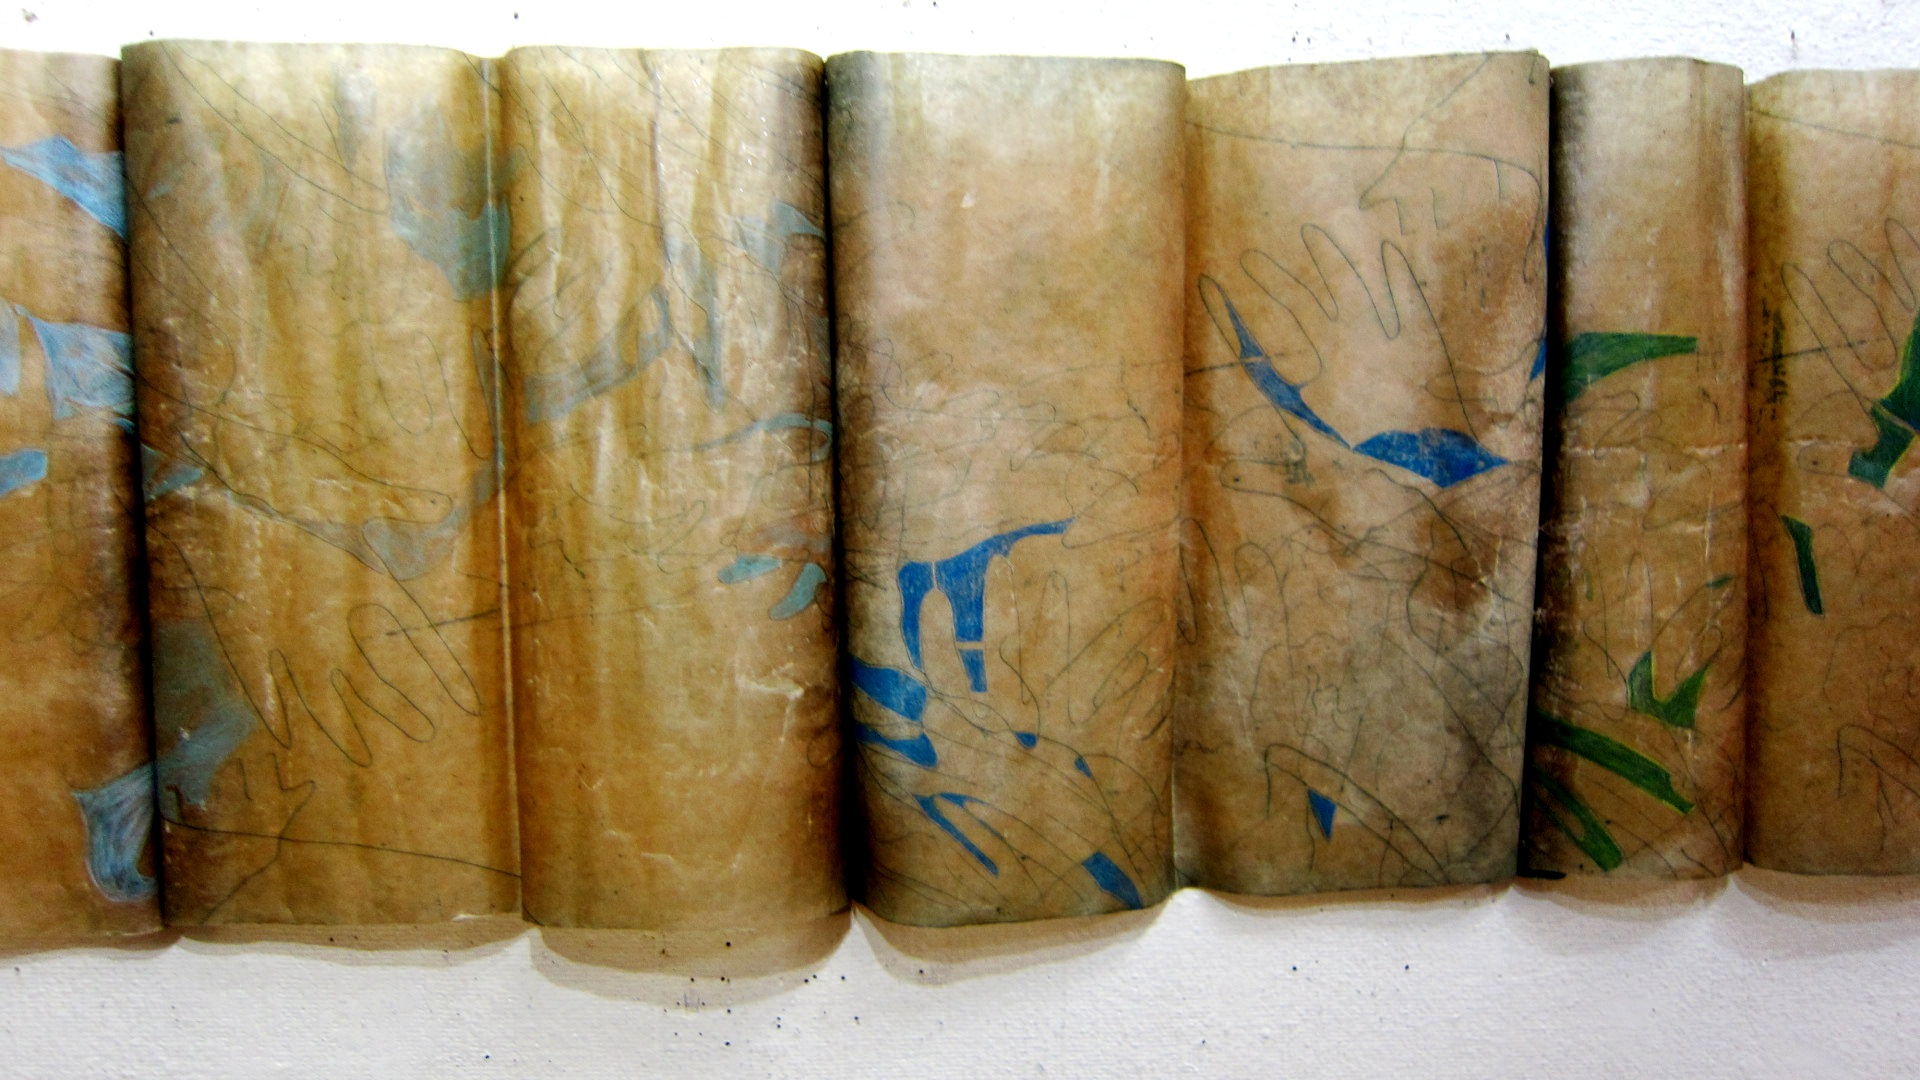 2408) 「BOOK\'S ART  9th」 たぴお 7月7日(月)~7月12日(土)_f0126829_100249.jpg